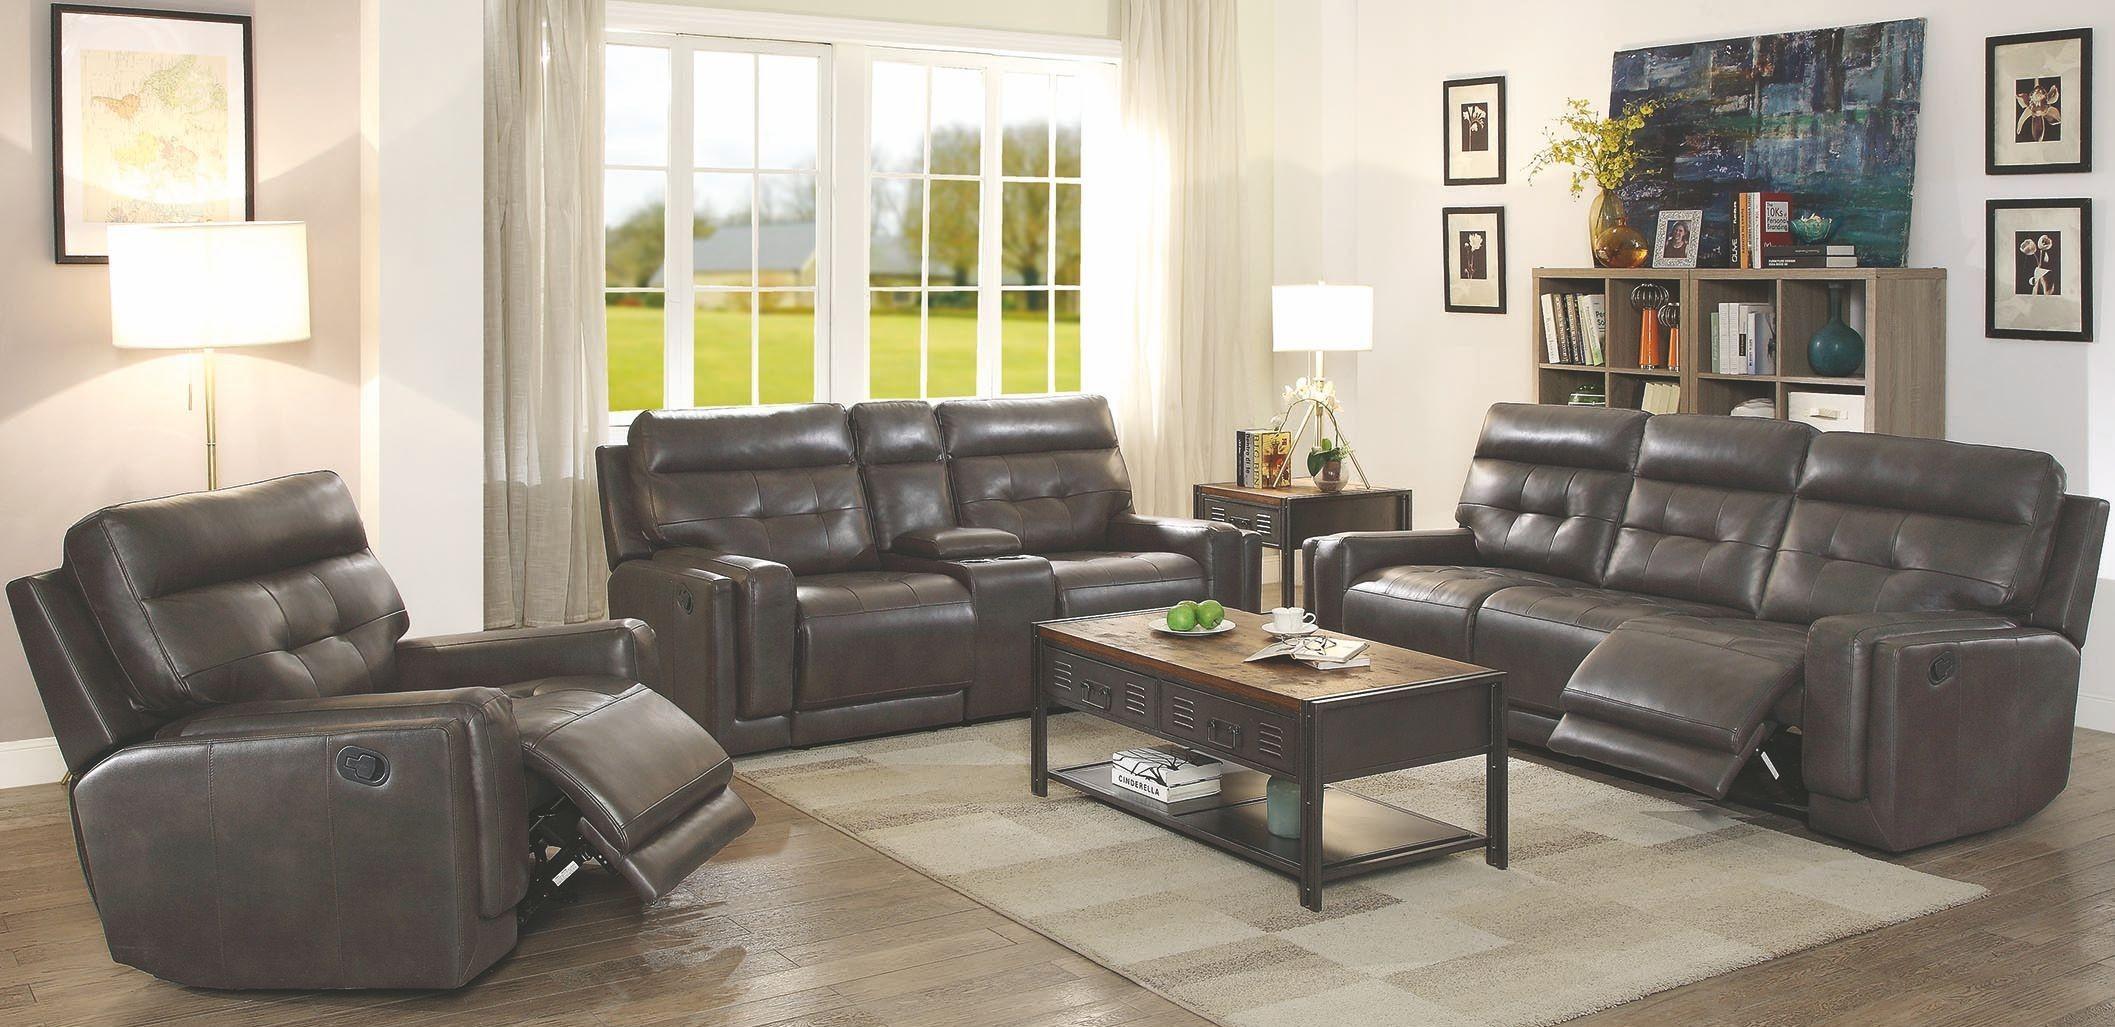 Trenton Motion Dark Grey Reclining Living Room Set 602064 Coaster Furniture